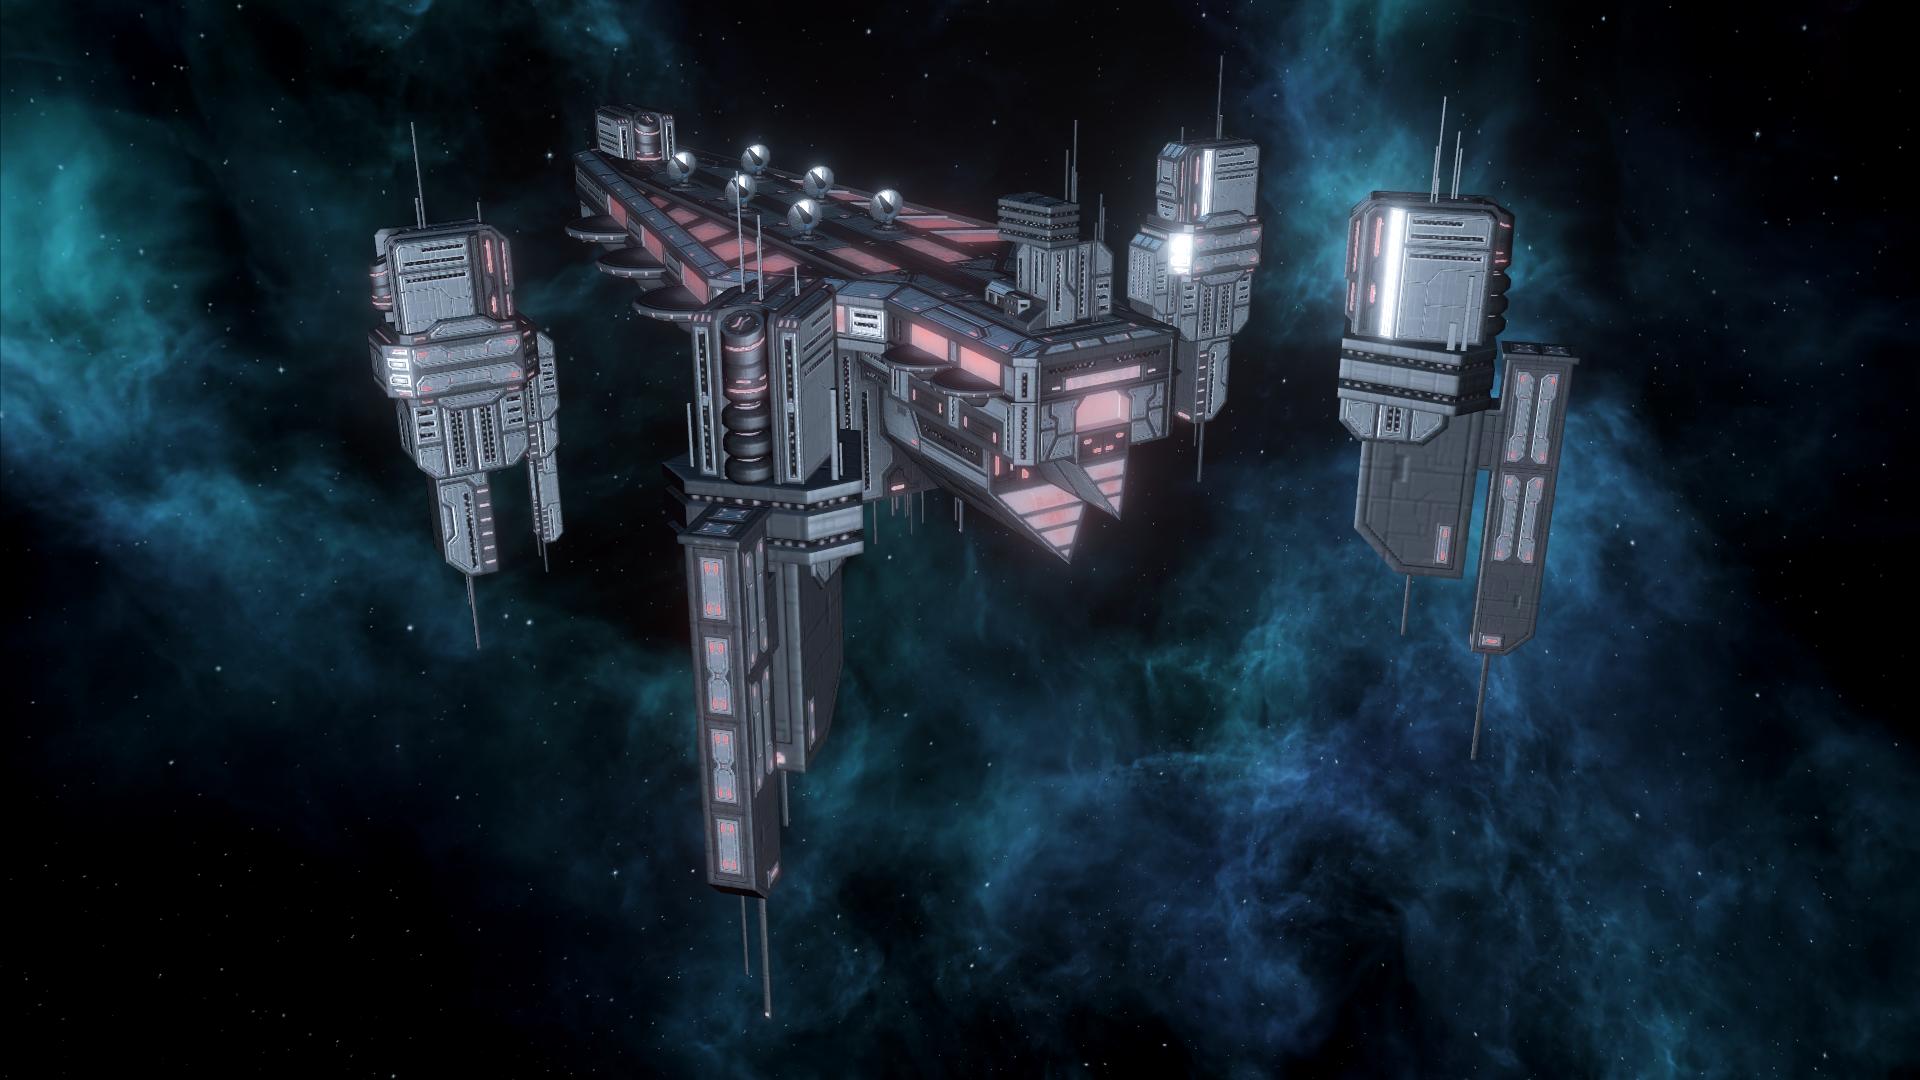 Stellaris Dev Diary #132 - Ecumenopolis and Megastructures